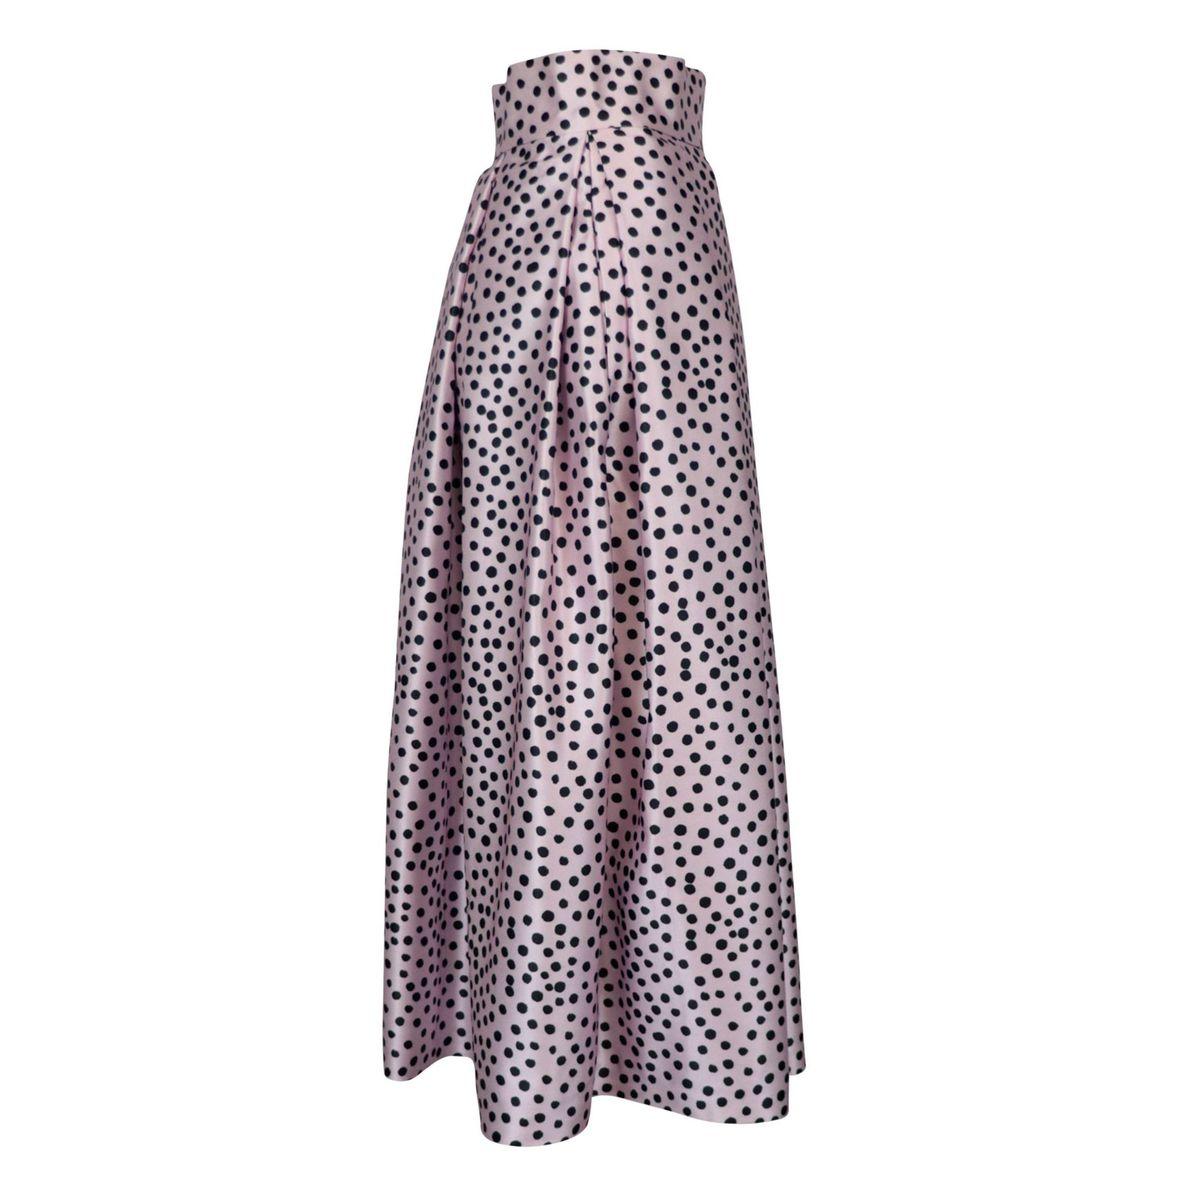 Duchess-print midi skirt Pink / black polka dots GIADA CURTI